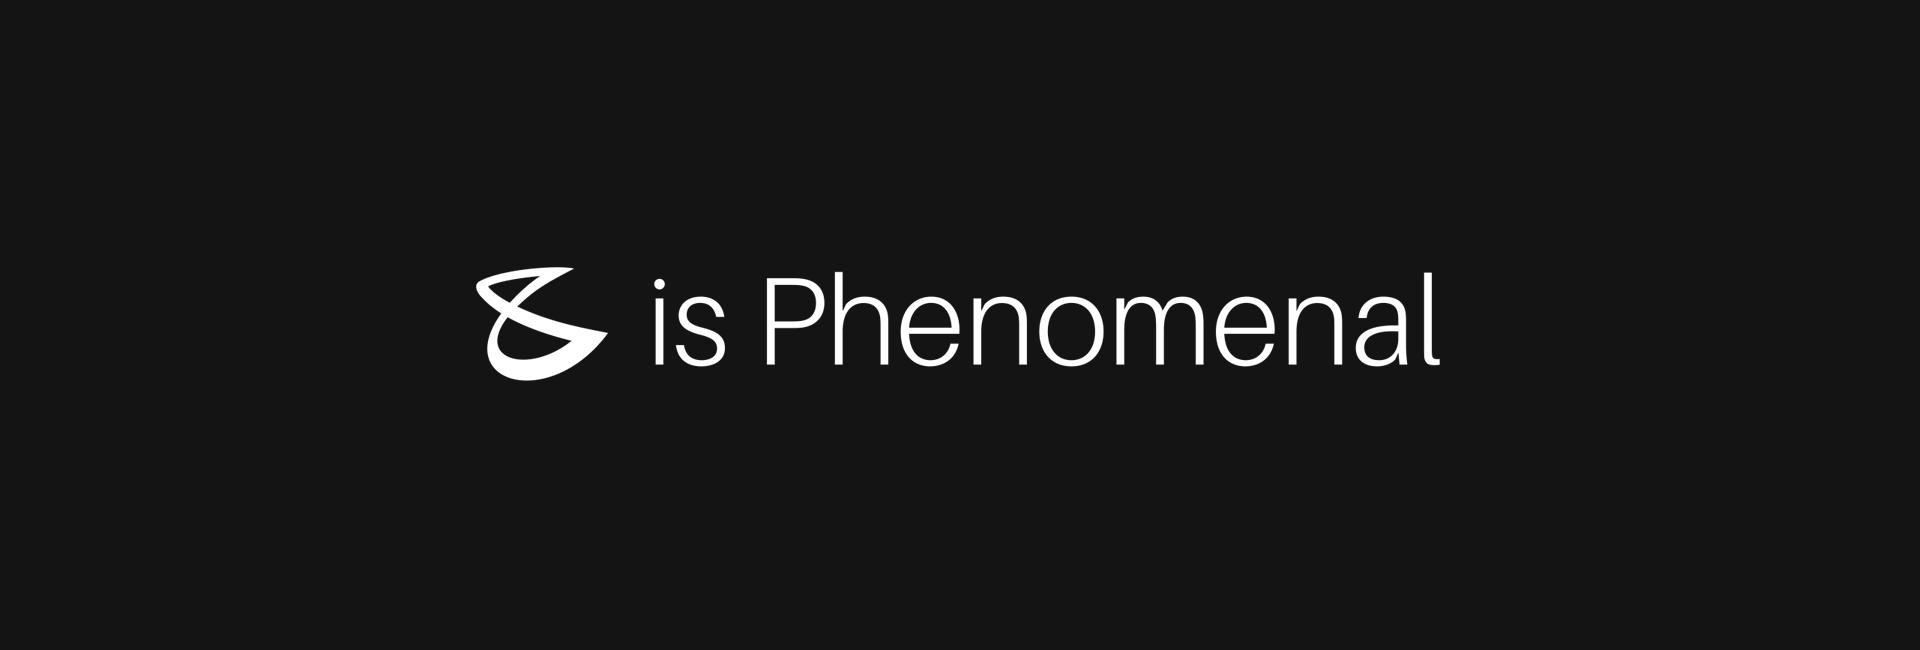 compubrain_is_phenomenal